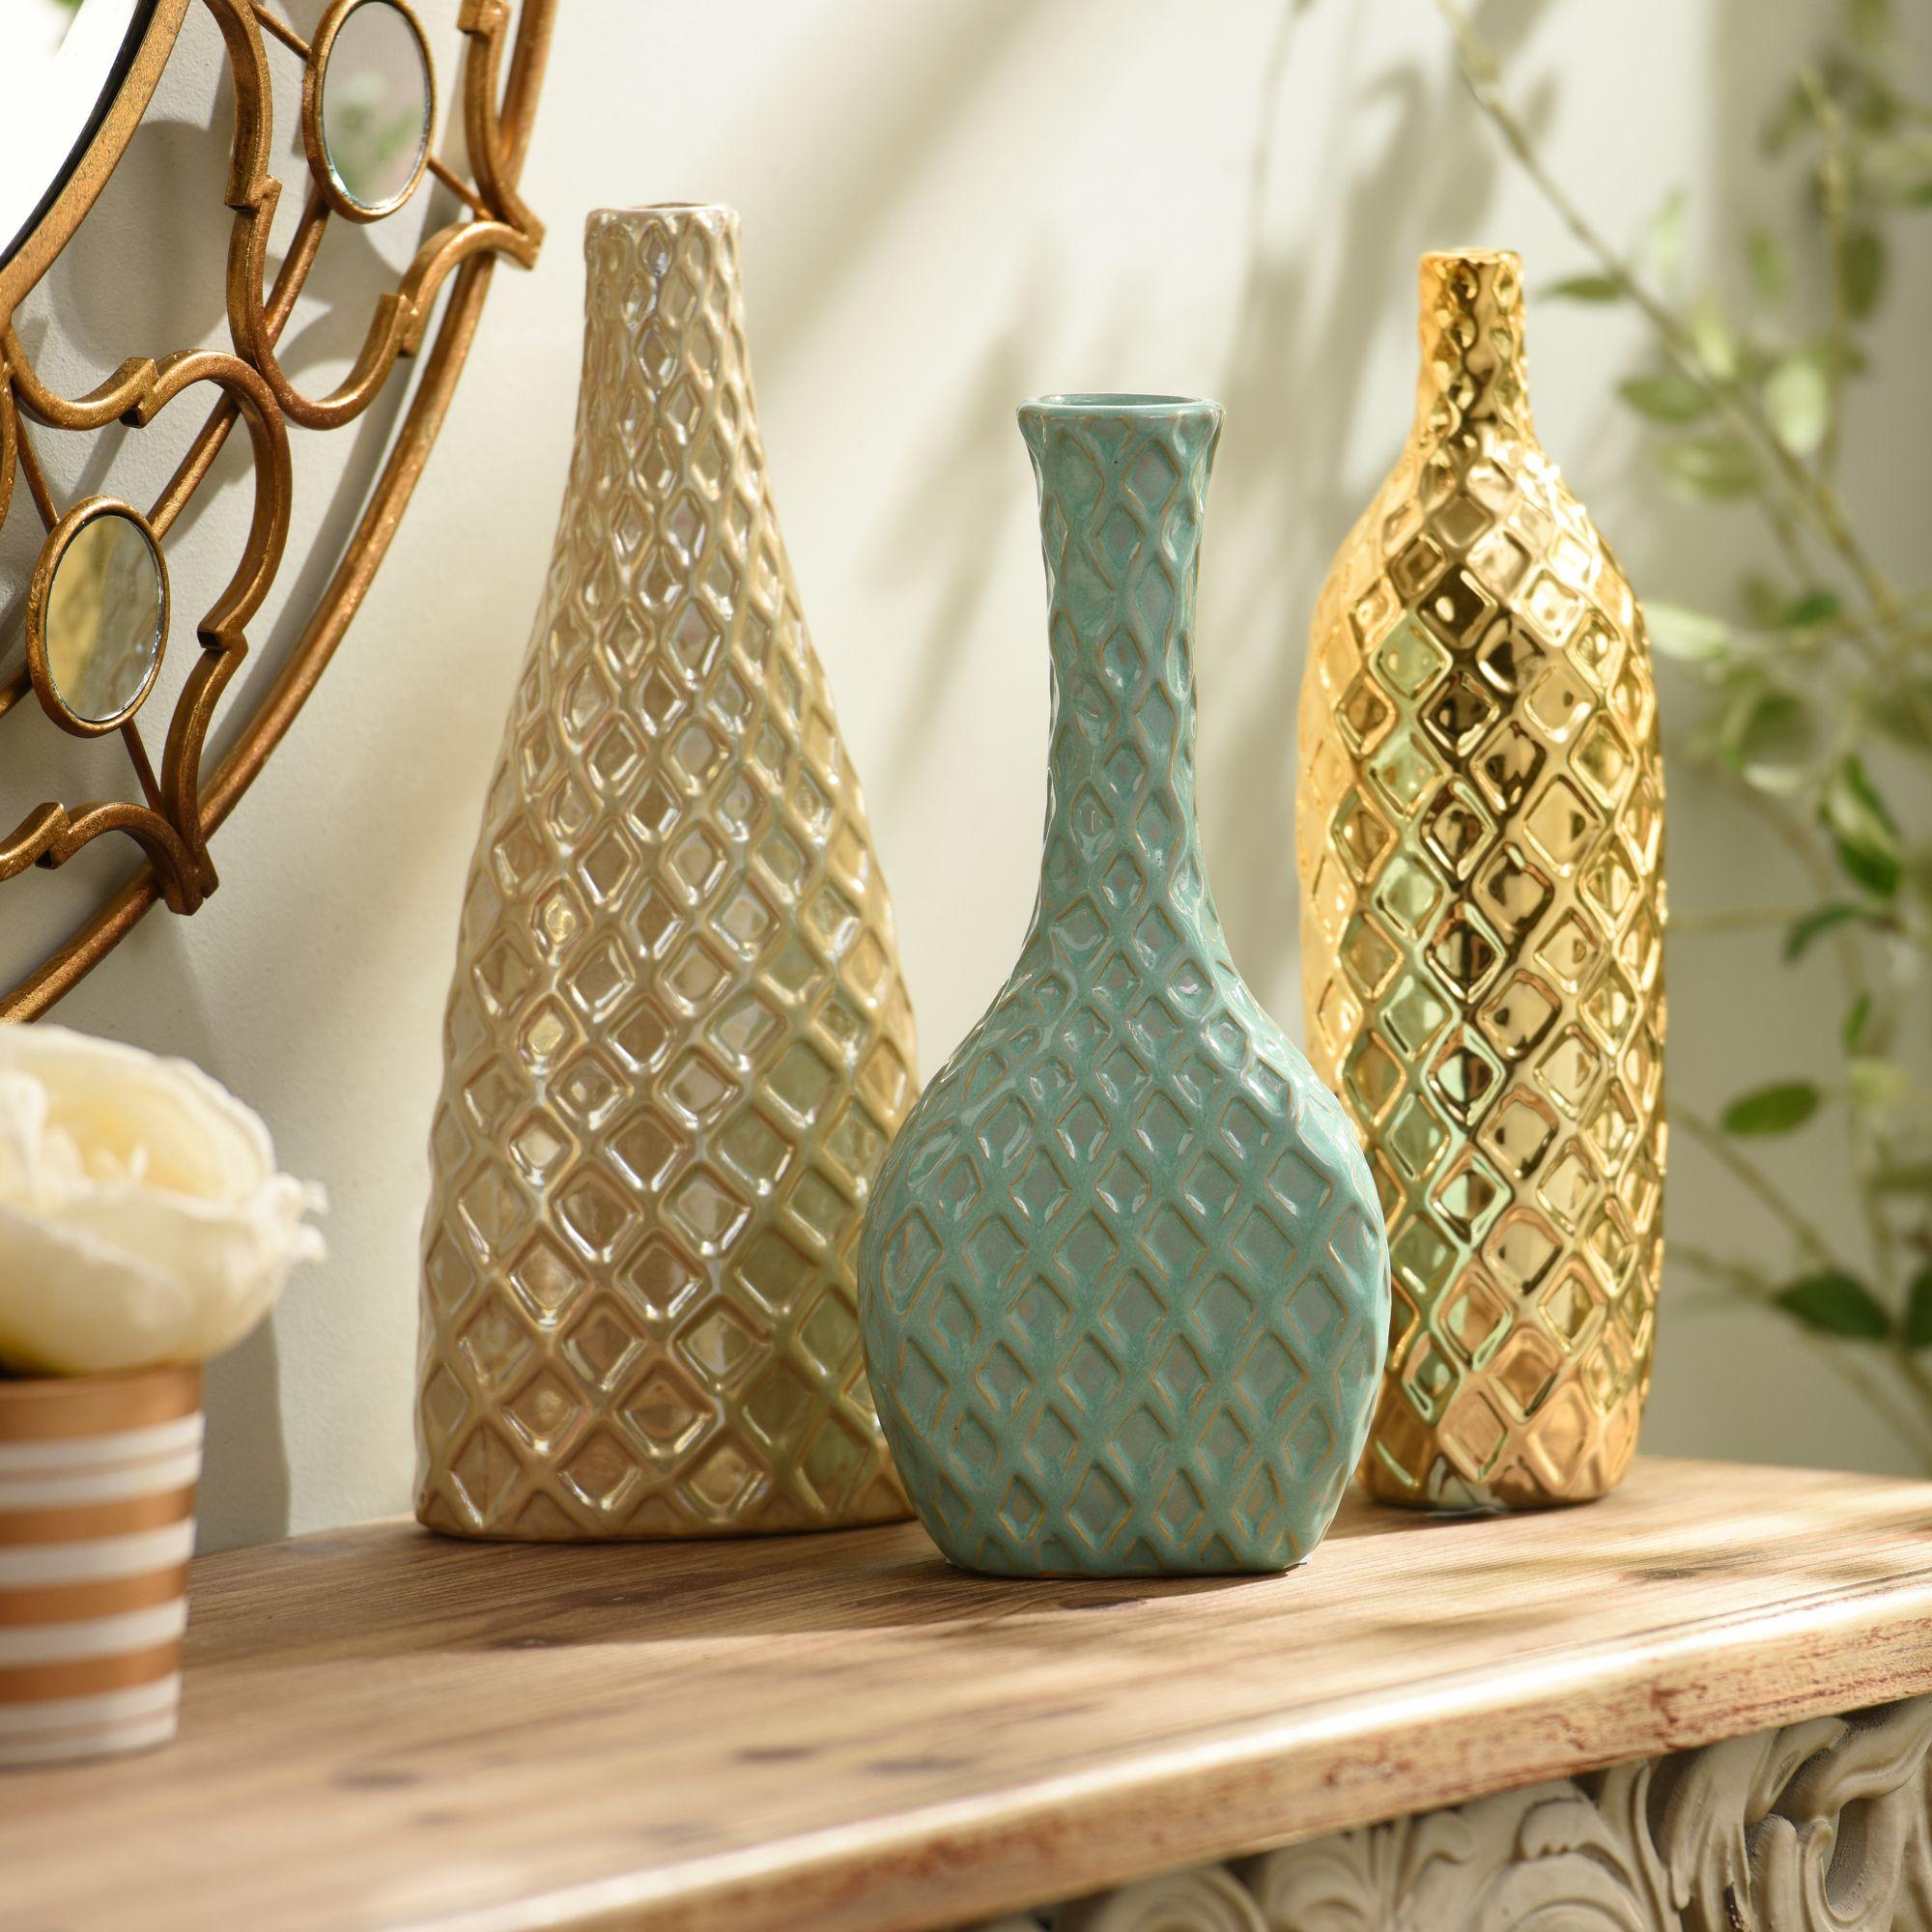 Search Results On 137252 Metal Vase Kirkland Home Decor Vases Decor